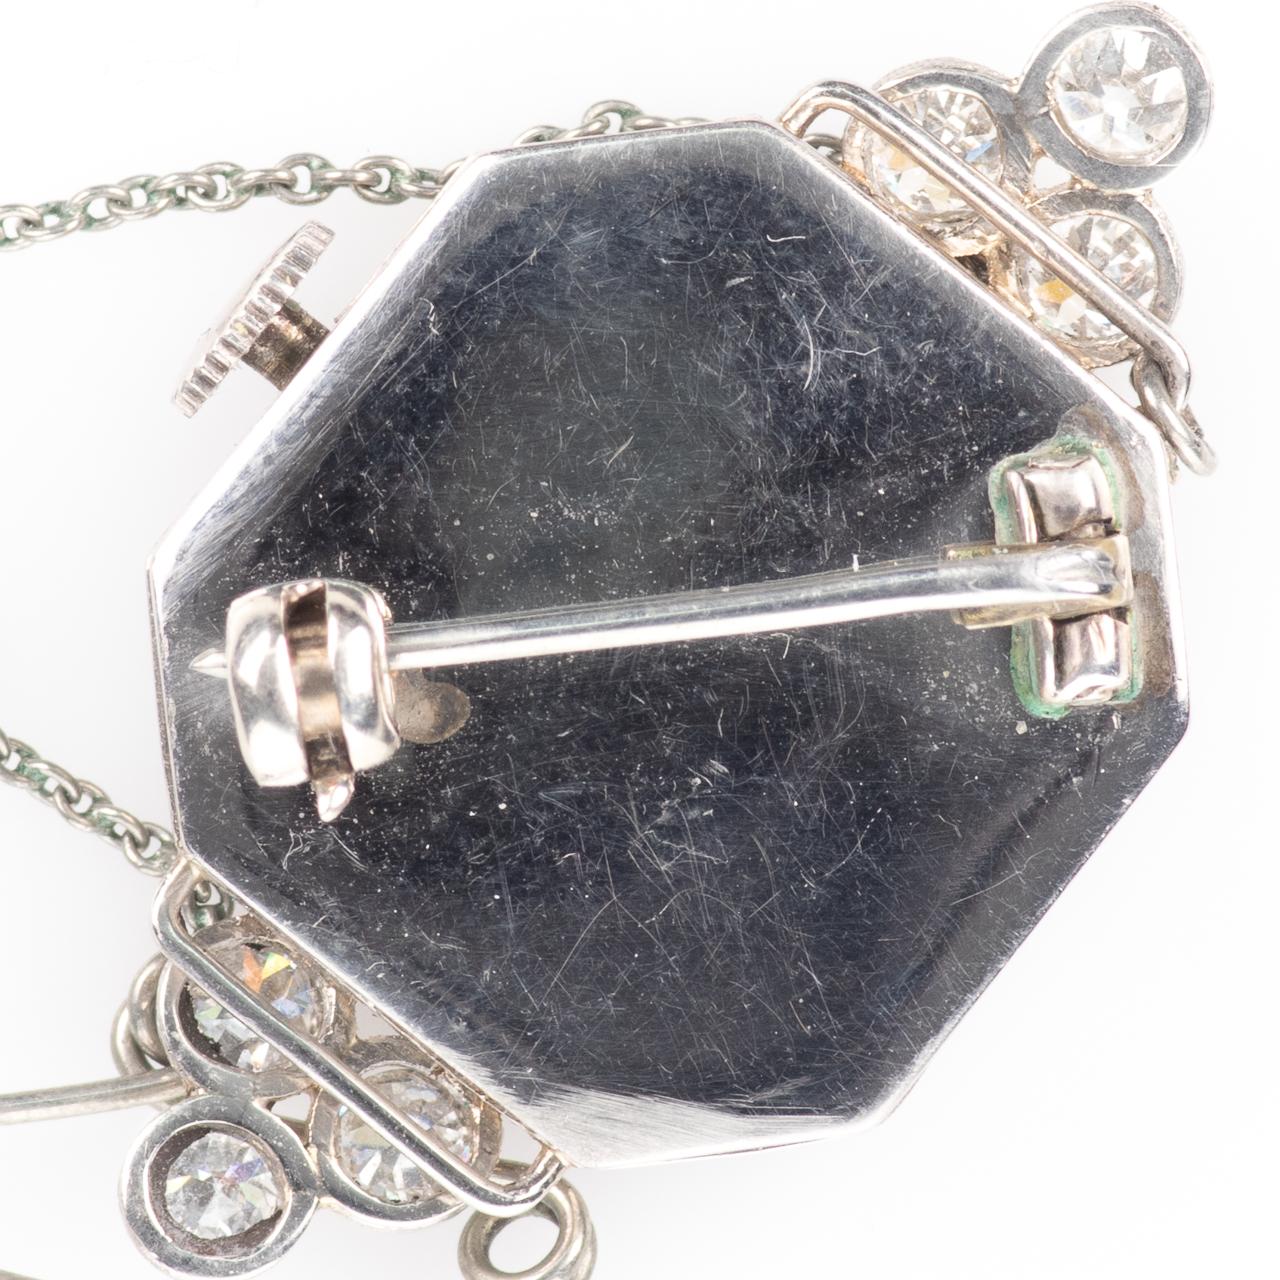 Platinum Art Deco 0.90ct Diamond Watch Brooch - Image 6 of 6